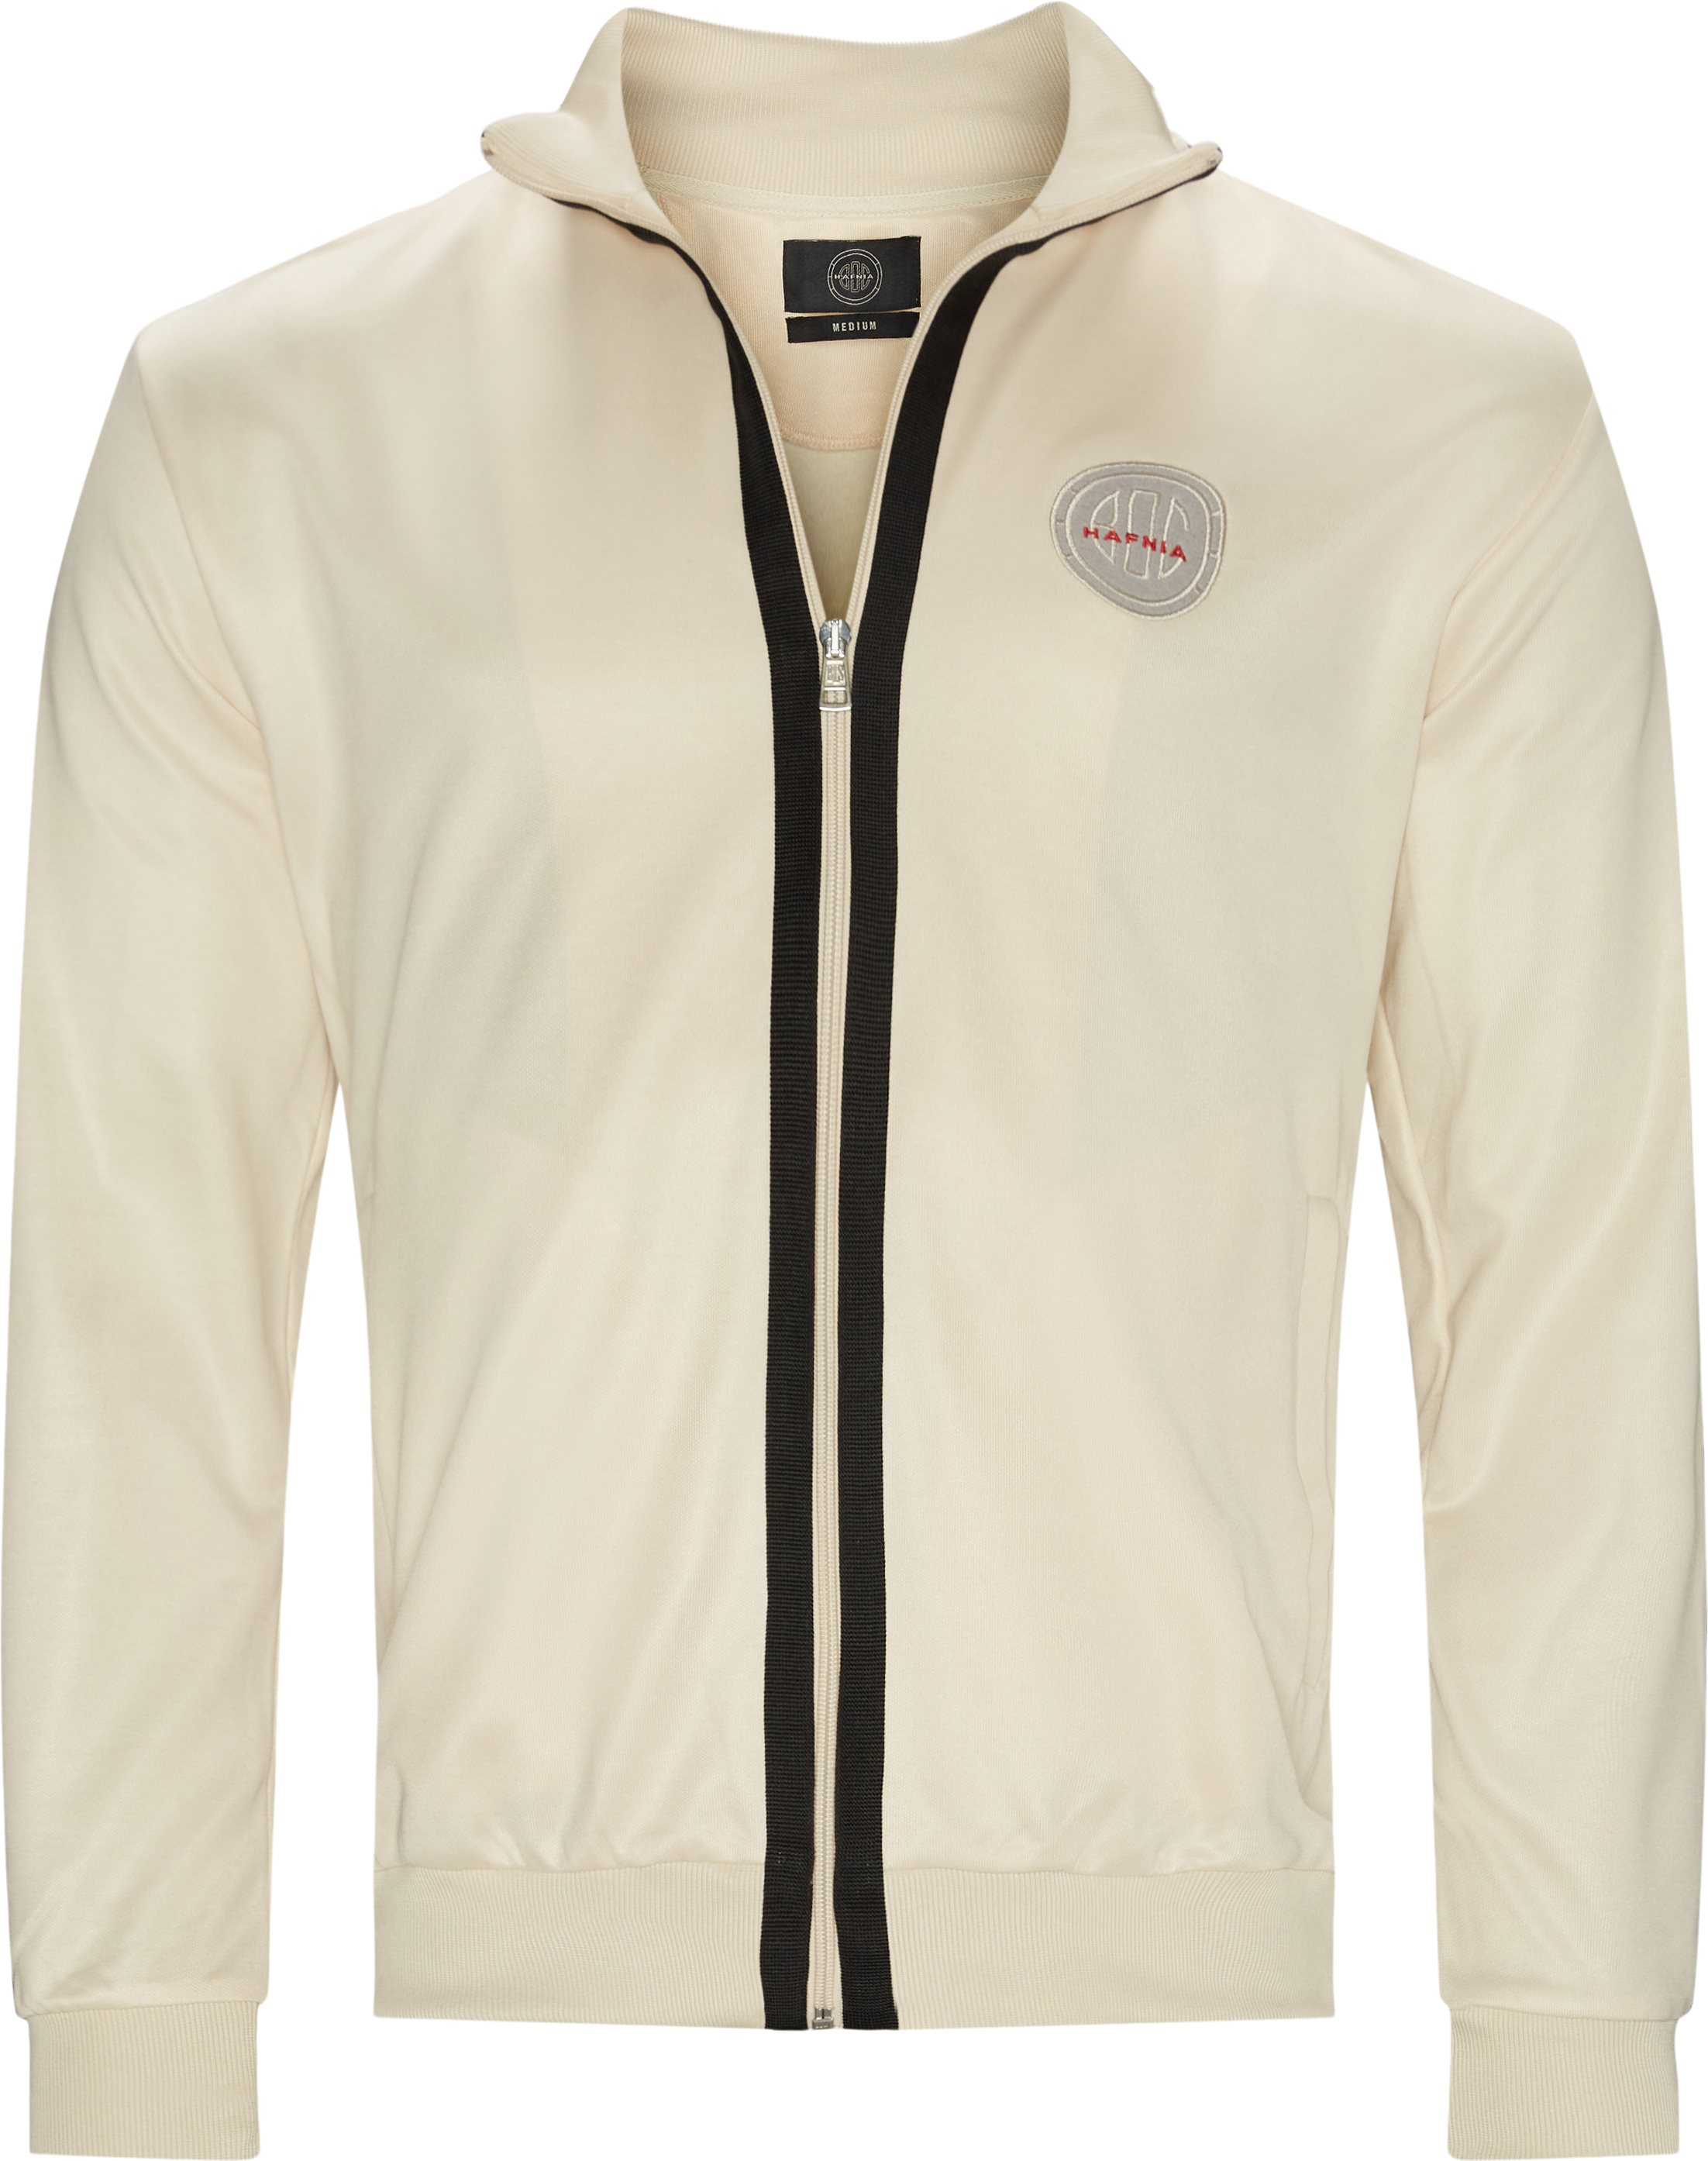 BOCxBLS Track Jacket - Sweatshirts - Regular fit - Sand